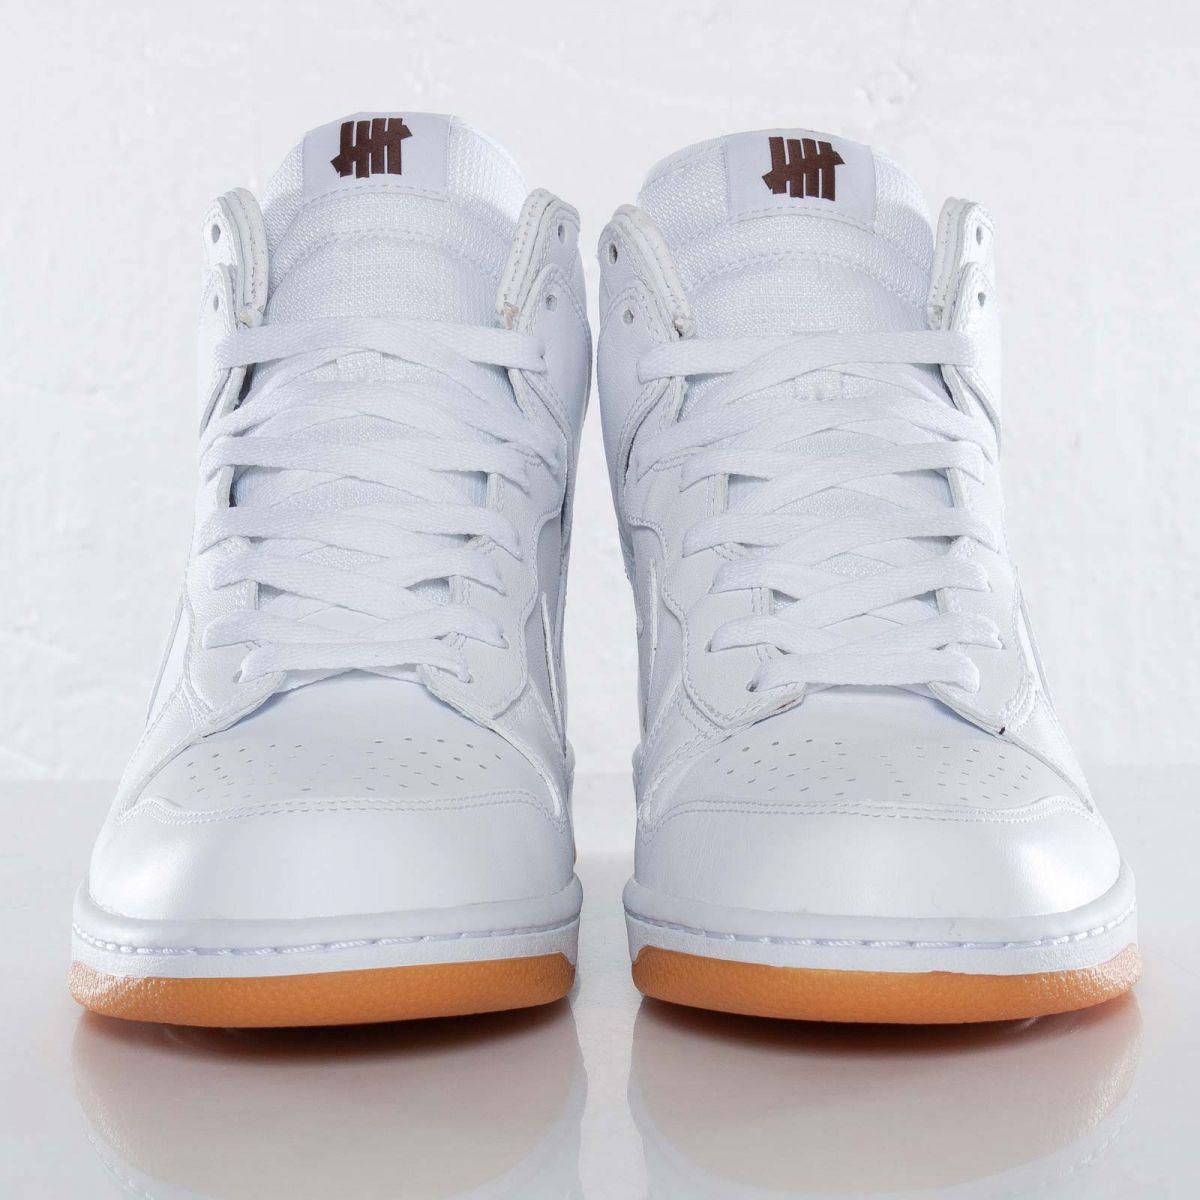 495d9379d4b6 Undefeated x Nike Dunk Hi PRM -